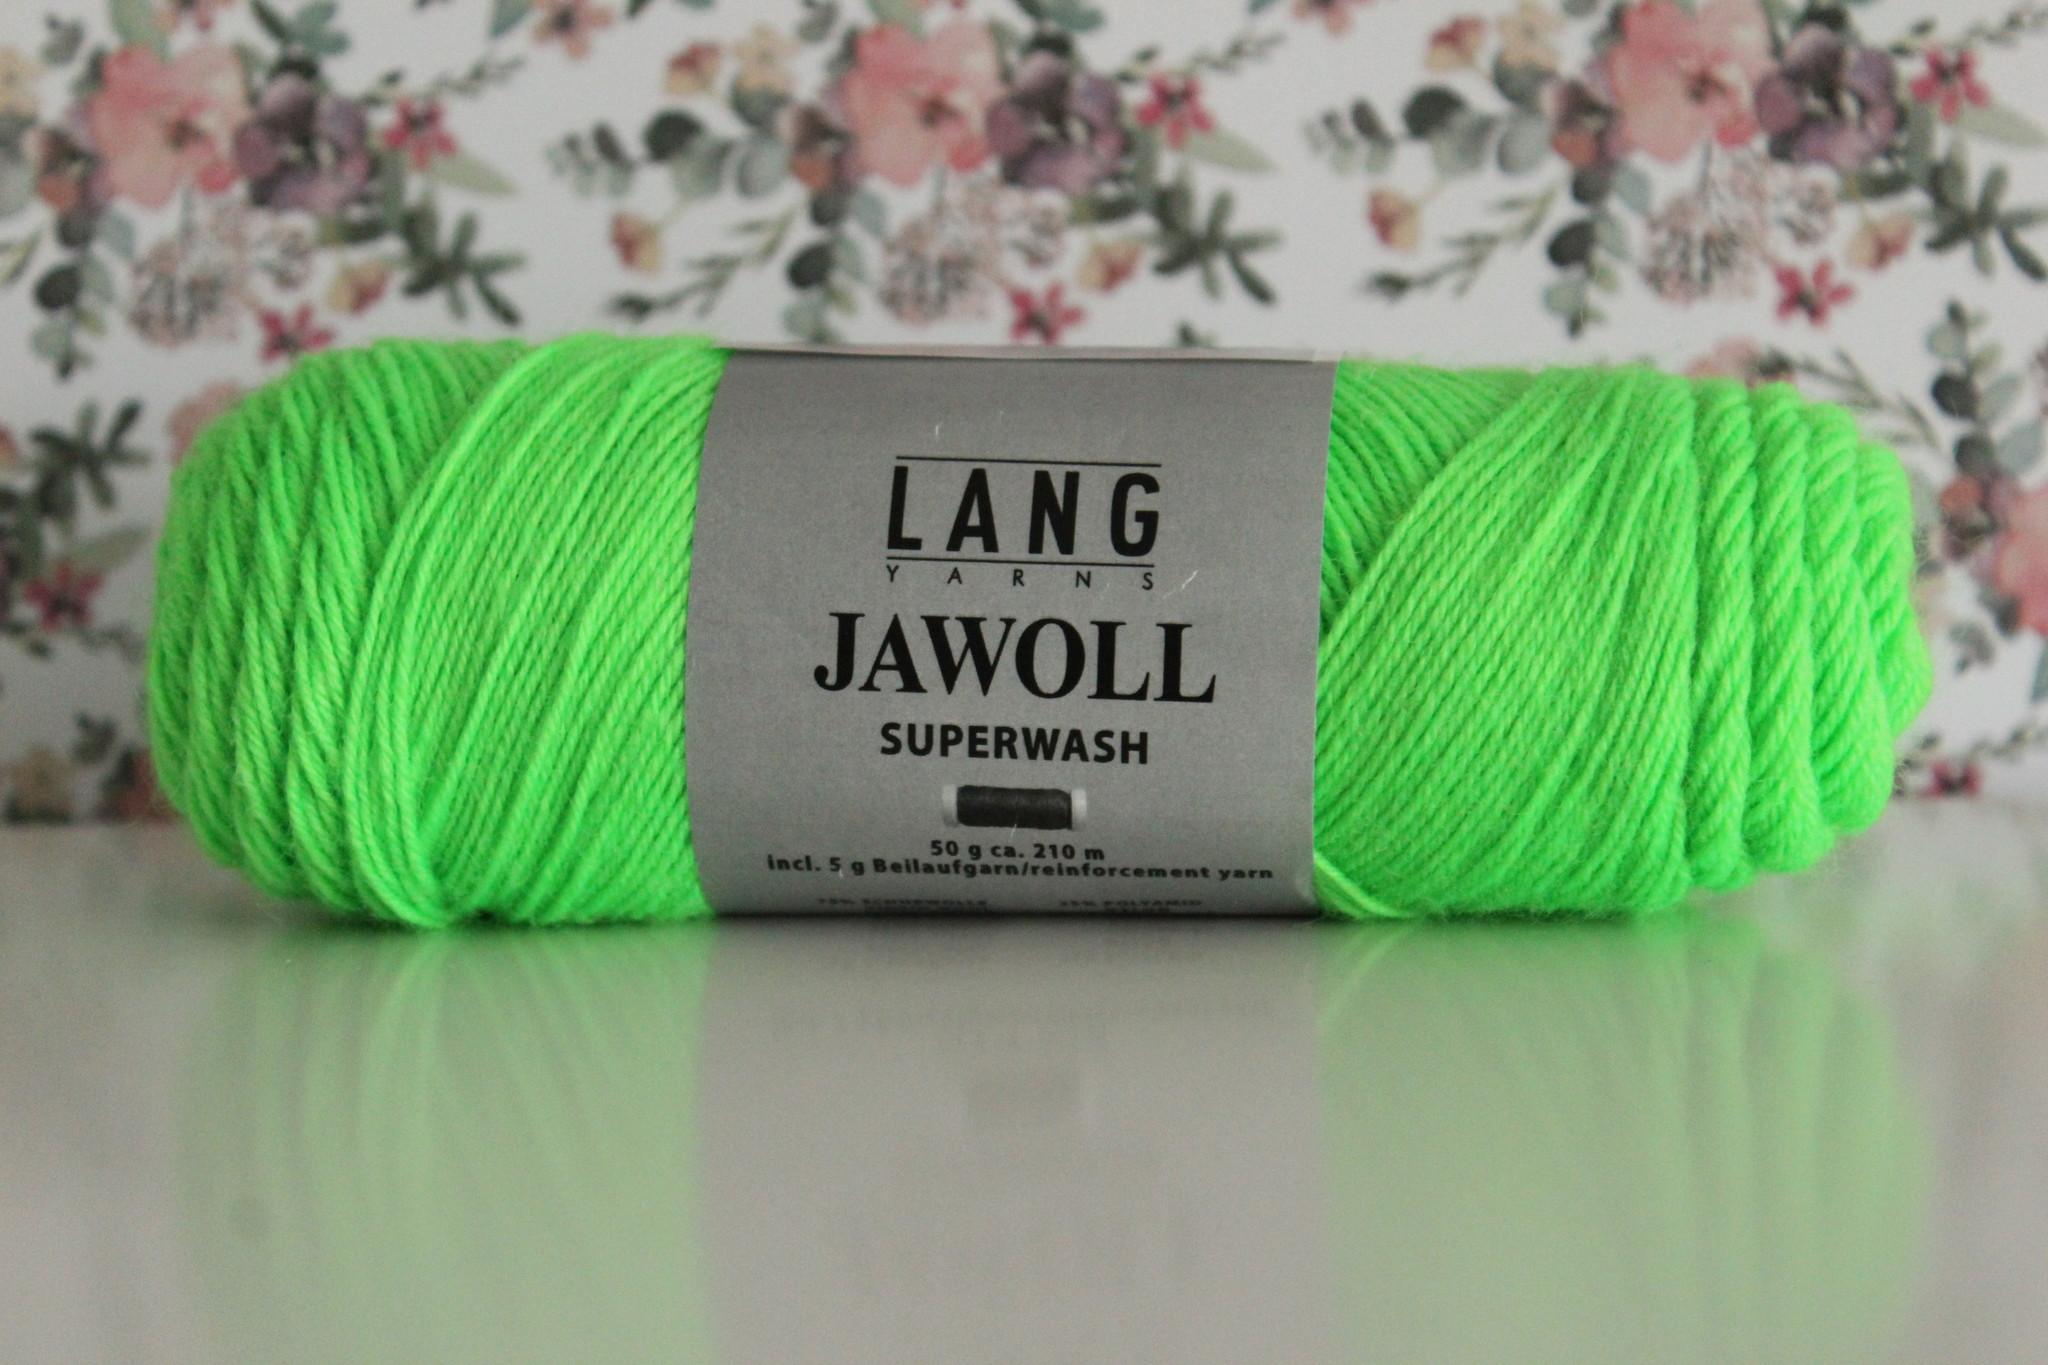 LangYarns JAWOLL Superwash 316 Neon Groen